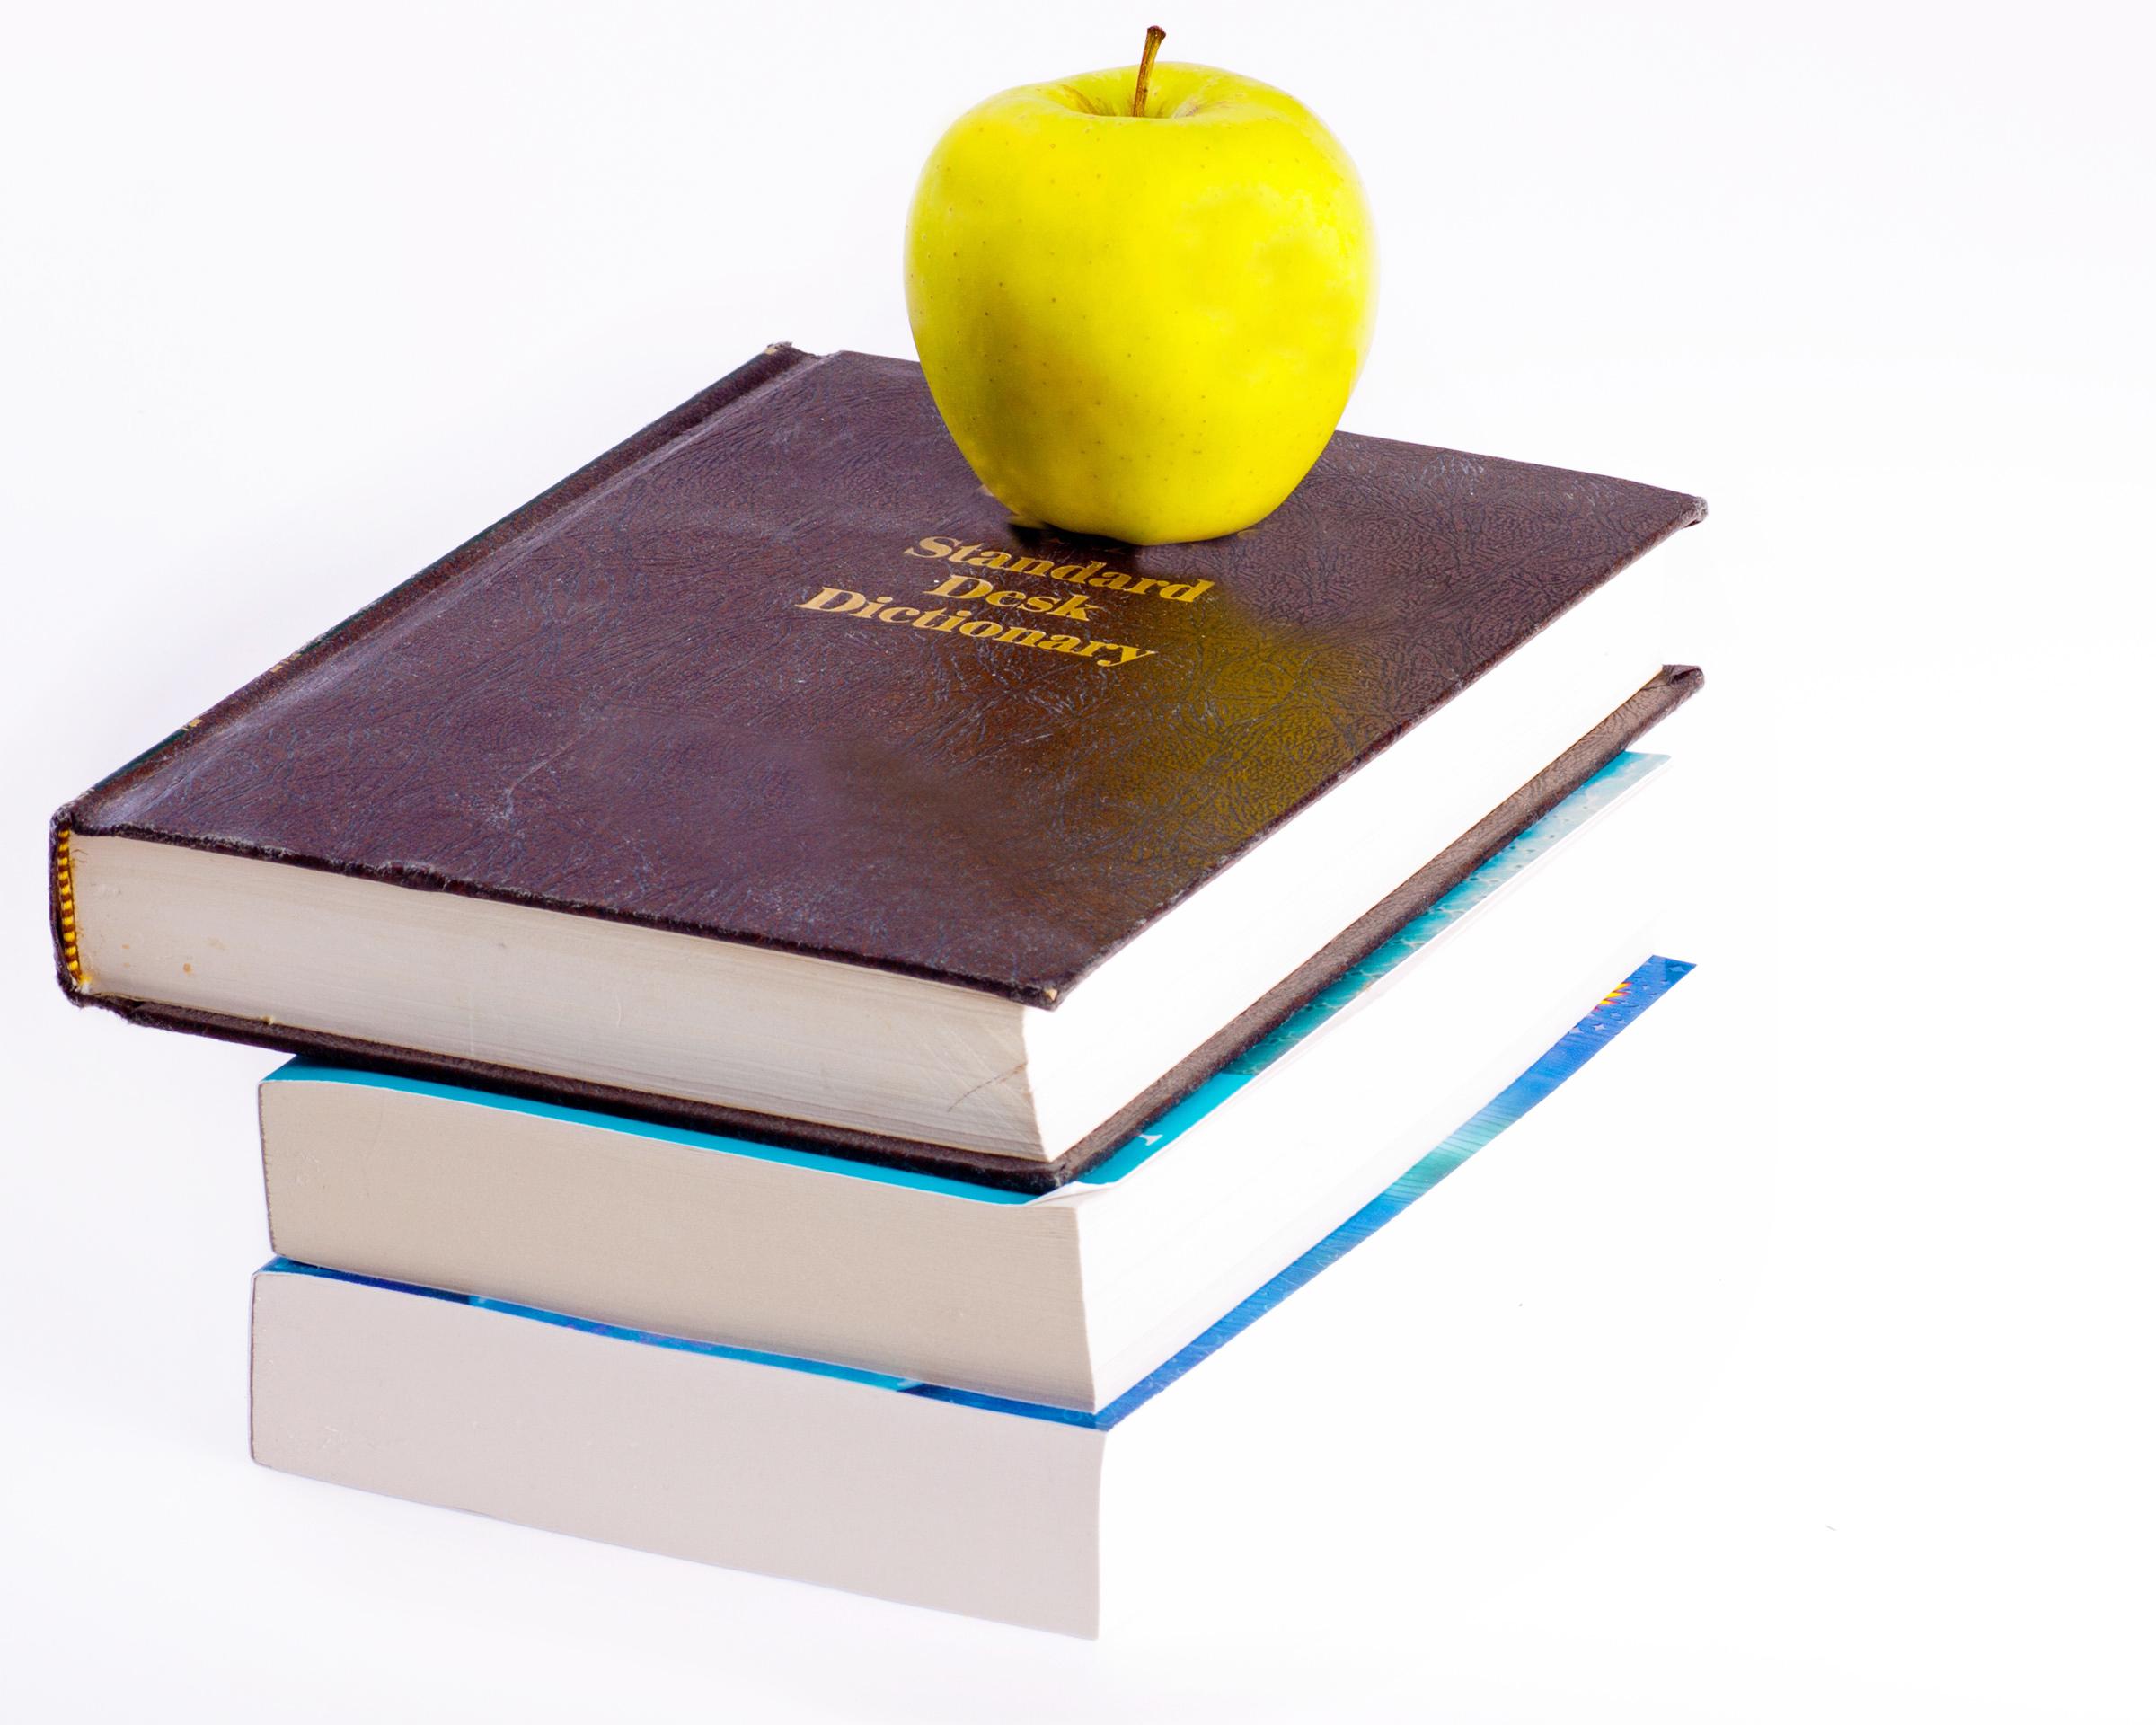 Health education photo